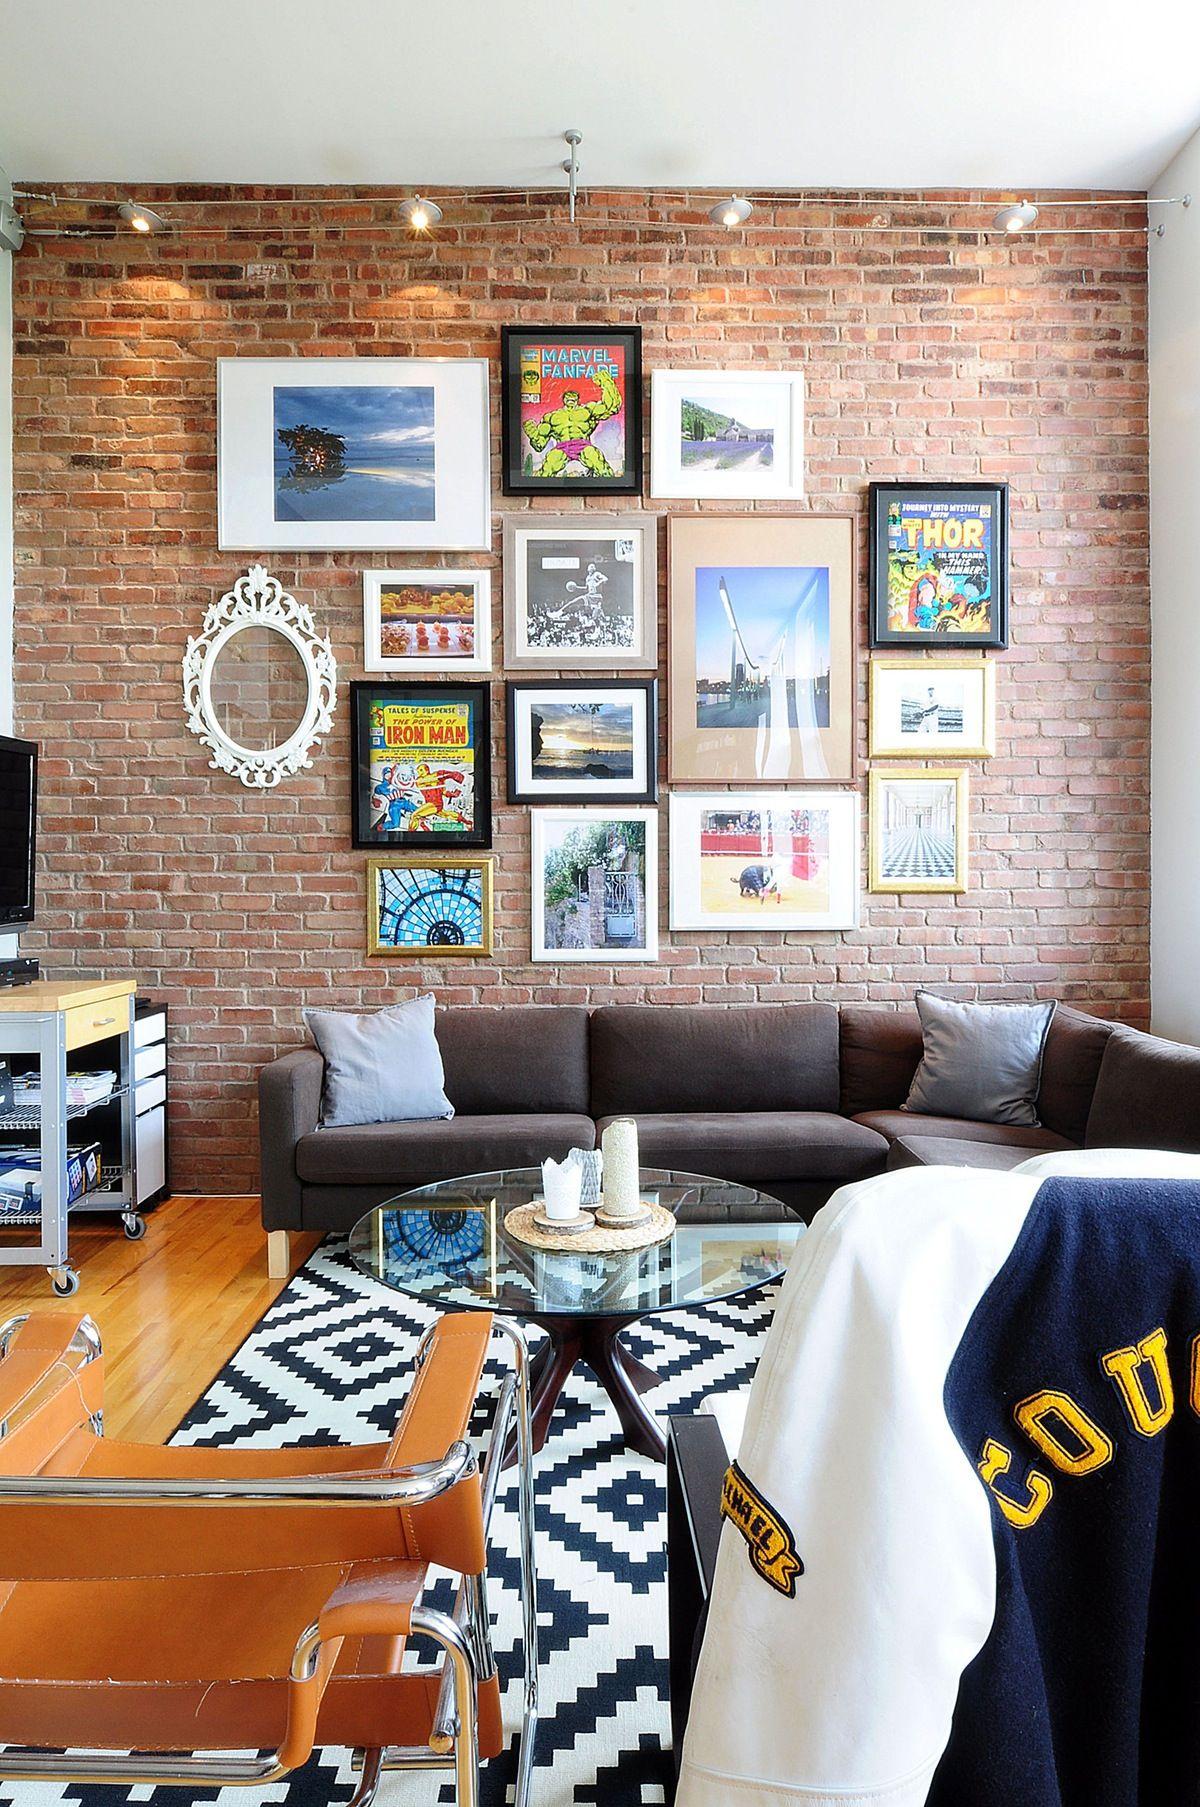 hip patterned industrial style in a montreal loft - Interieur Mit Rustikalen Akzenten Loft Design Bilder